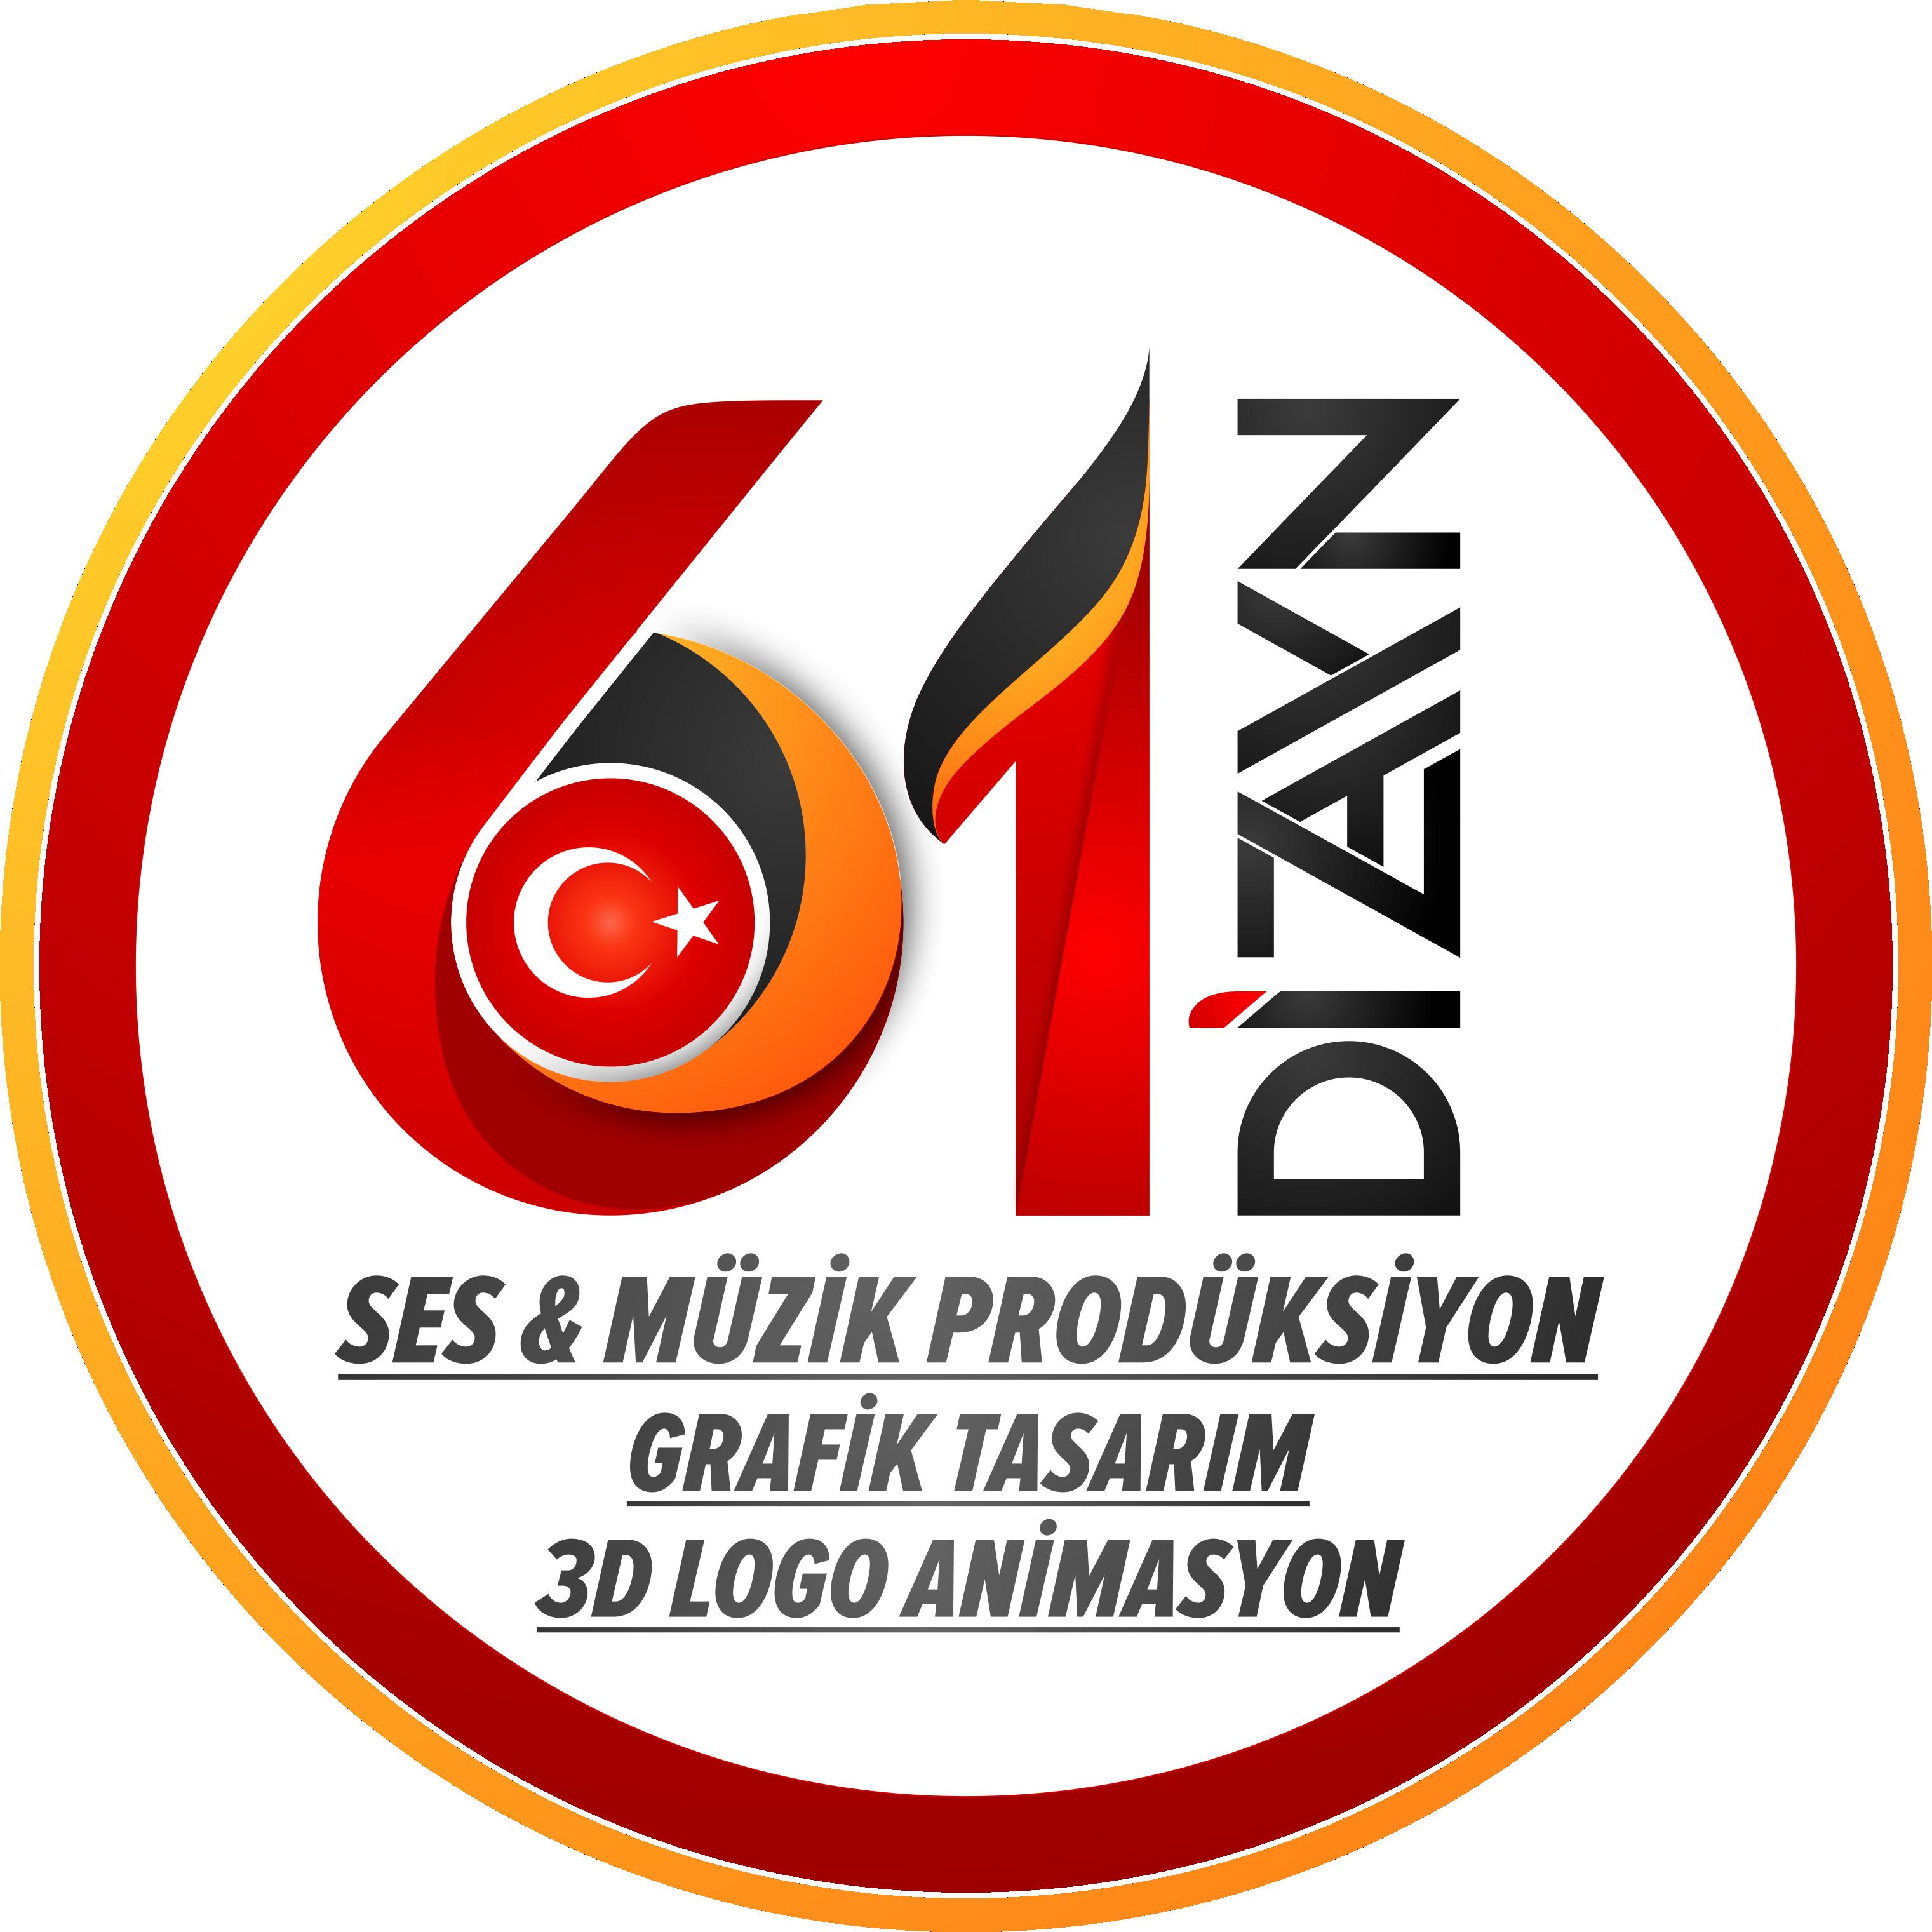 Trabzon 61 - Freelance Grafik Tasarım